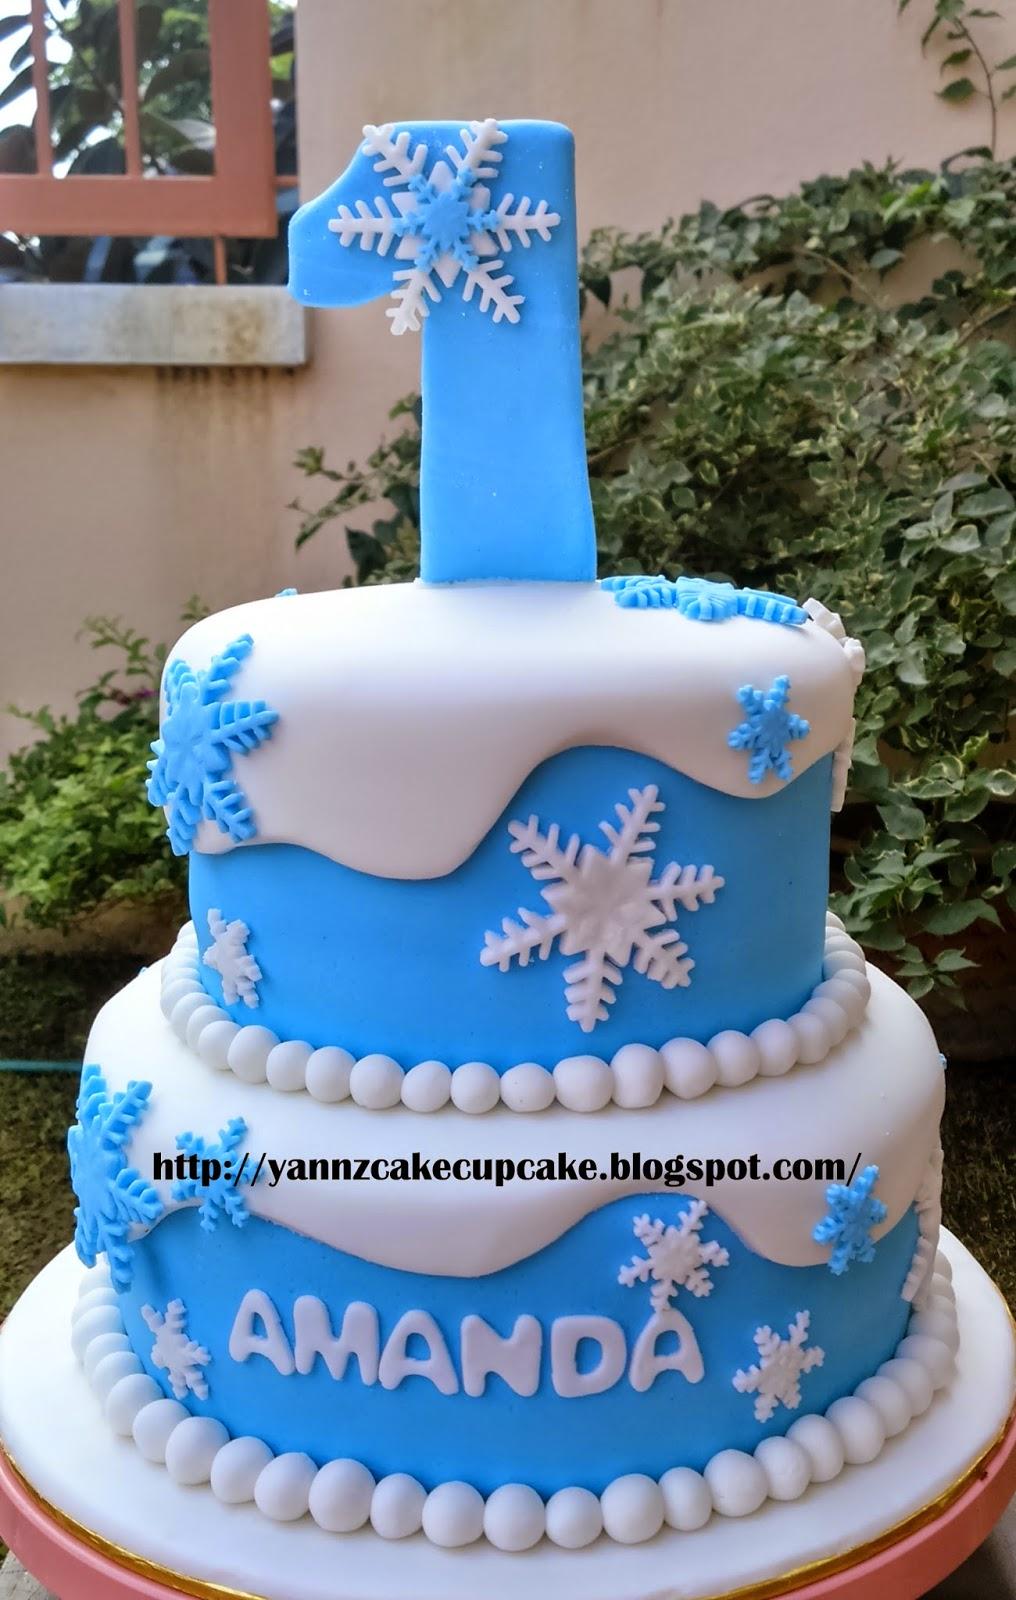 Frozen Cake For Amanda Yannzcakecupcakecom